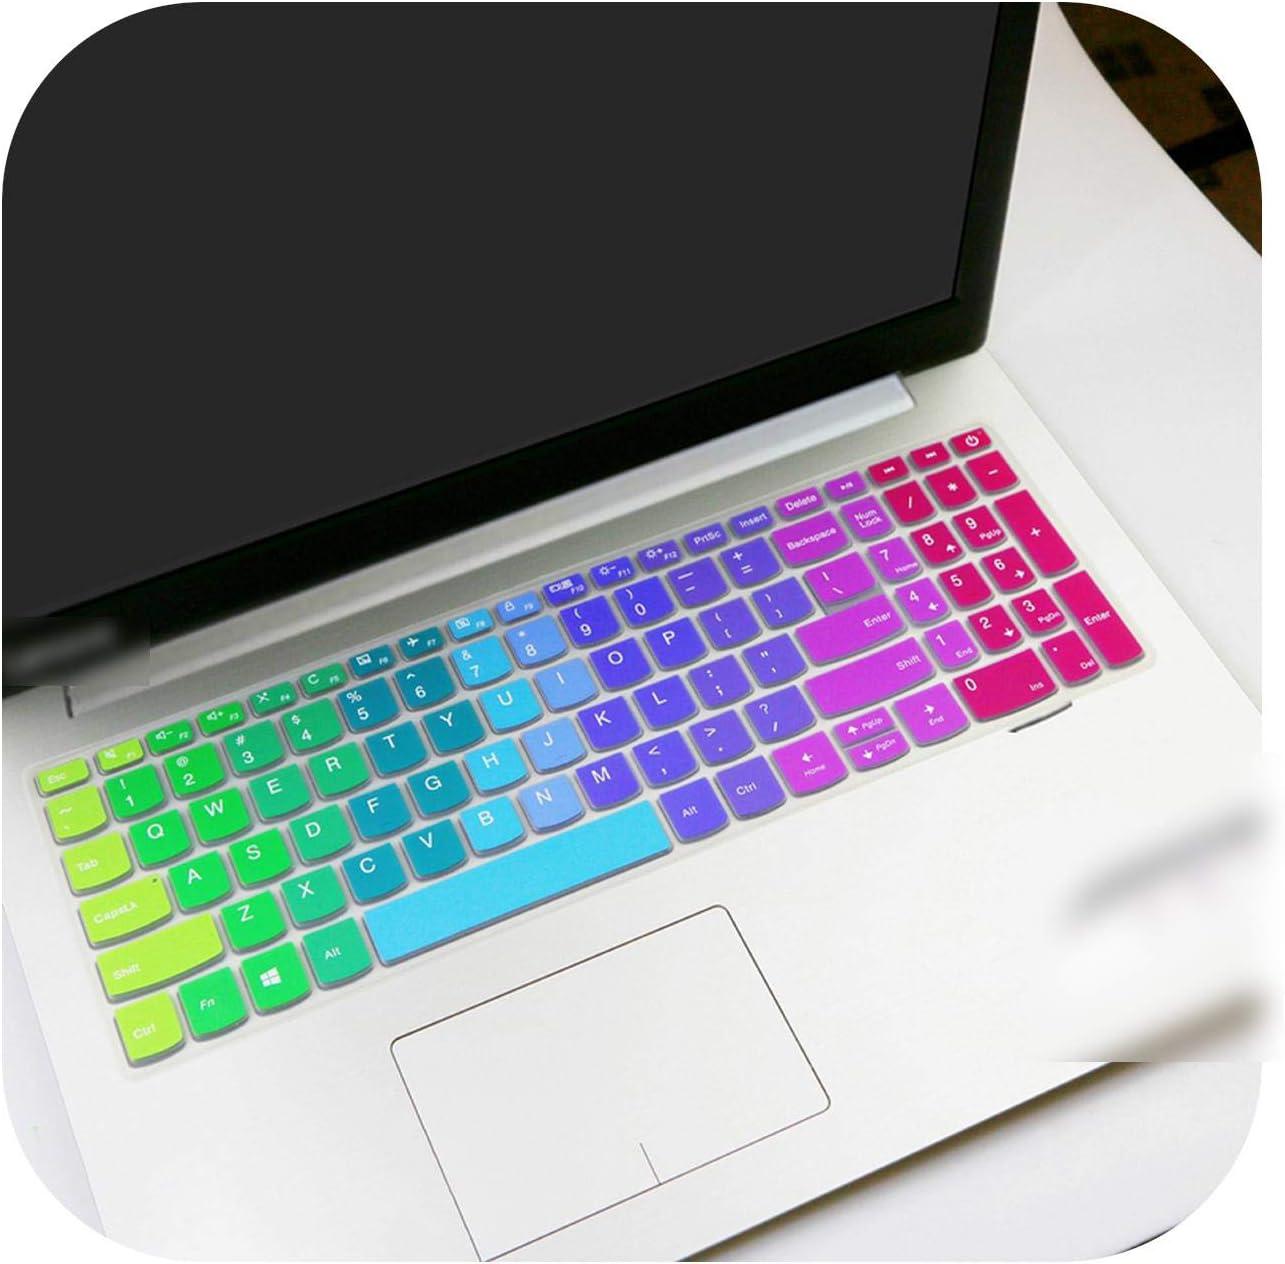 Laptop Keyboard Cover Skin Protector for Lenovo Ideapad 320 330 17 330-17 330-17Ikb 320-17Ikbr V320-17Ikb 330-17Ikbr 17.3 Inch-Rainbow-